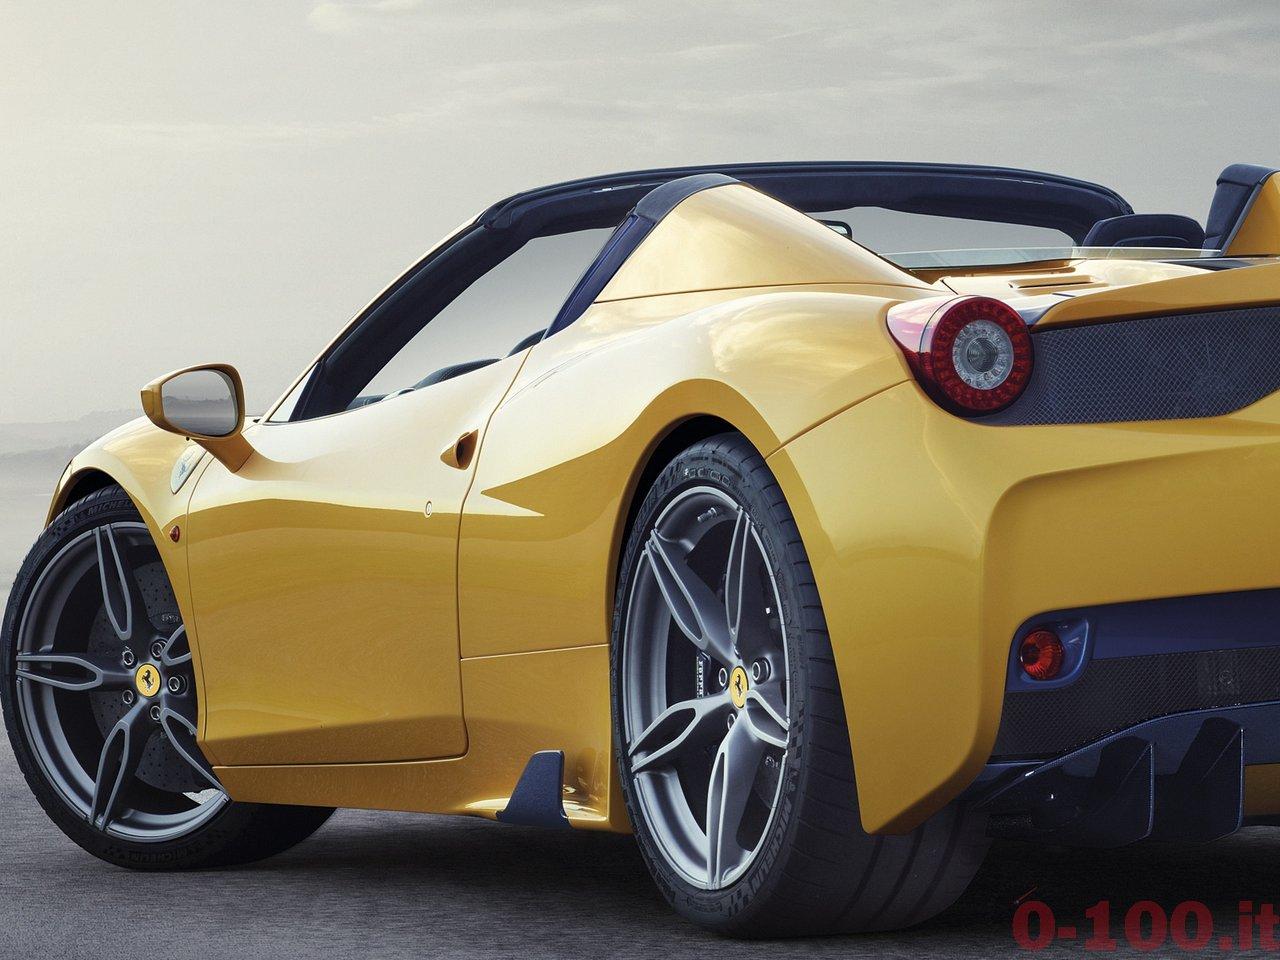 ferrari-458-speciale-aperta-2015_0-100_16